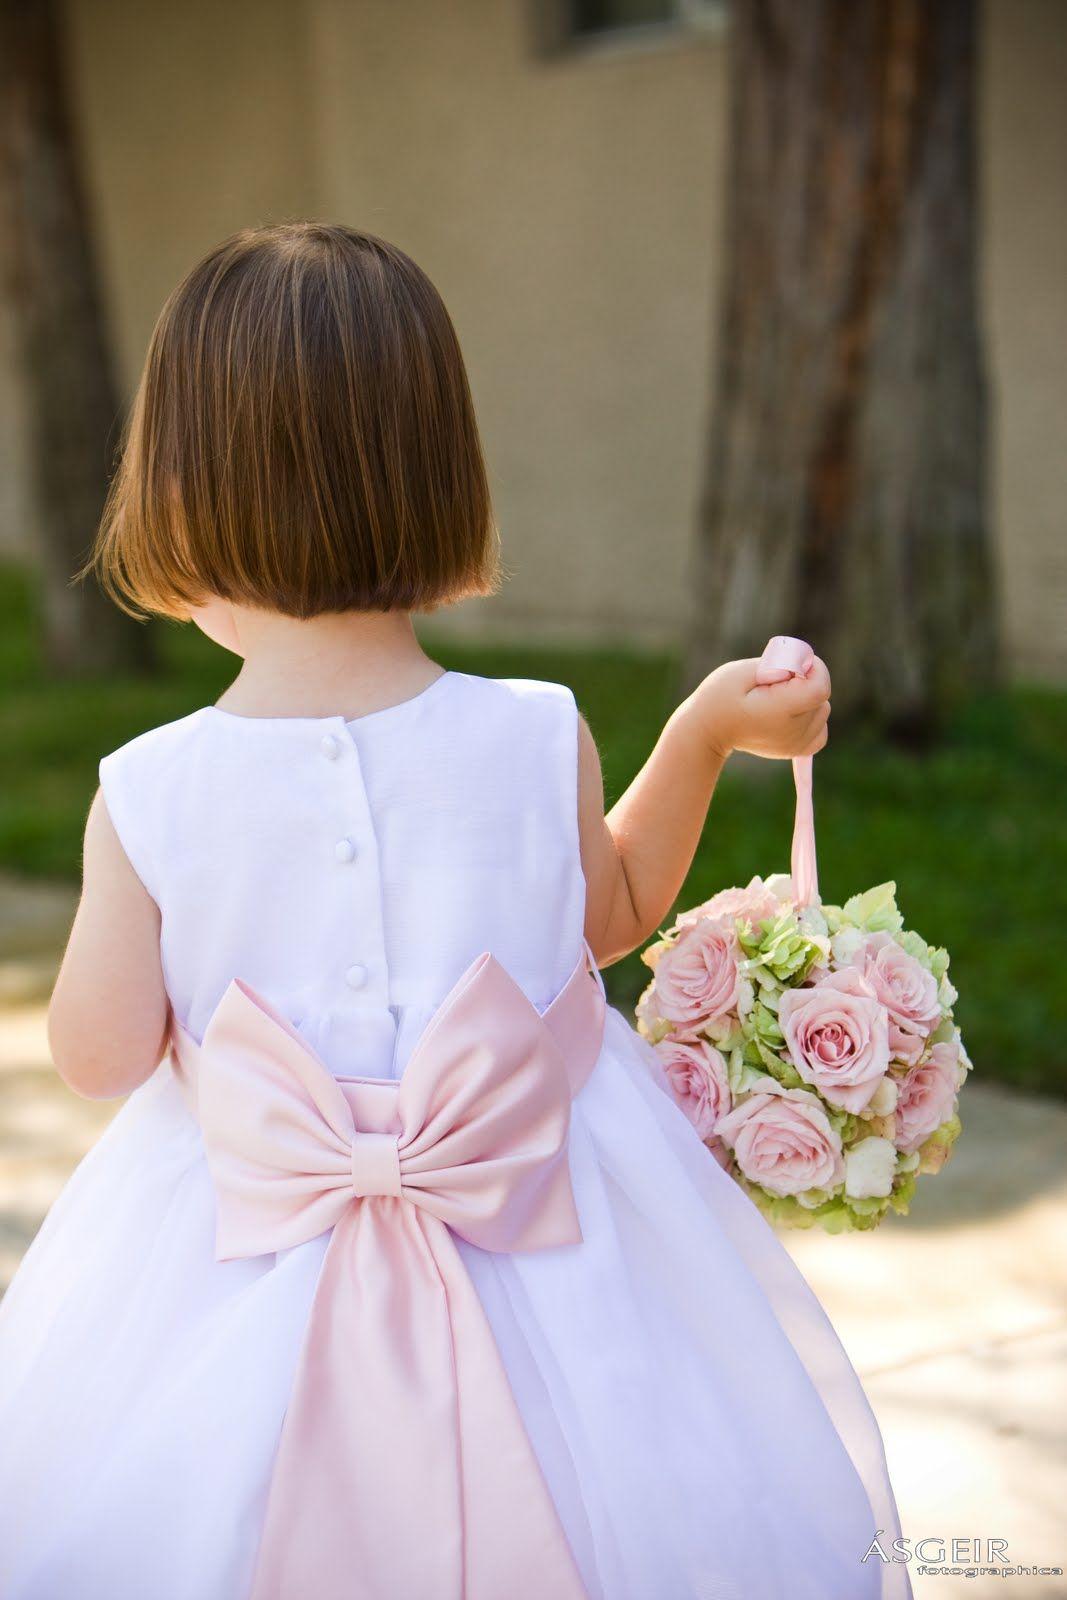 flower girl kissing ball - Google Search | Cecilia inspiration board ...